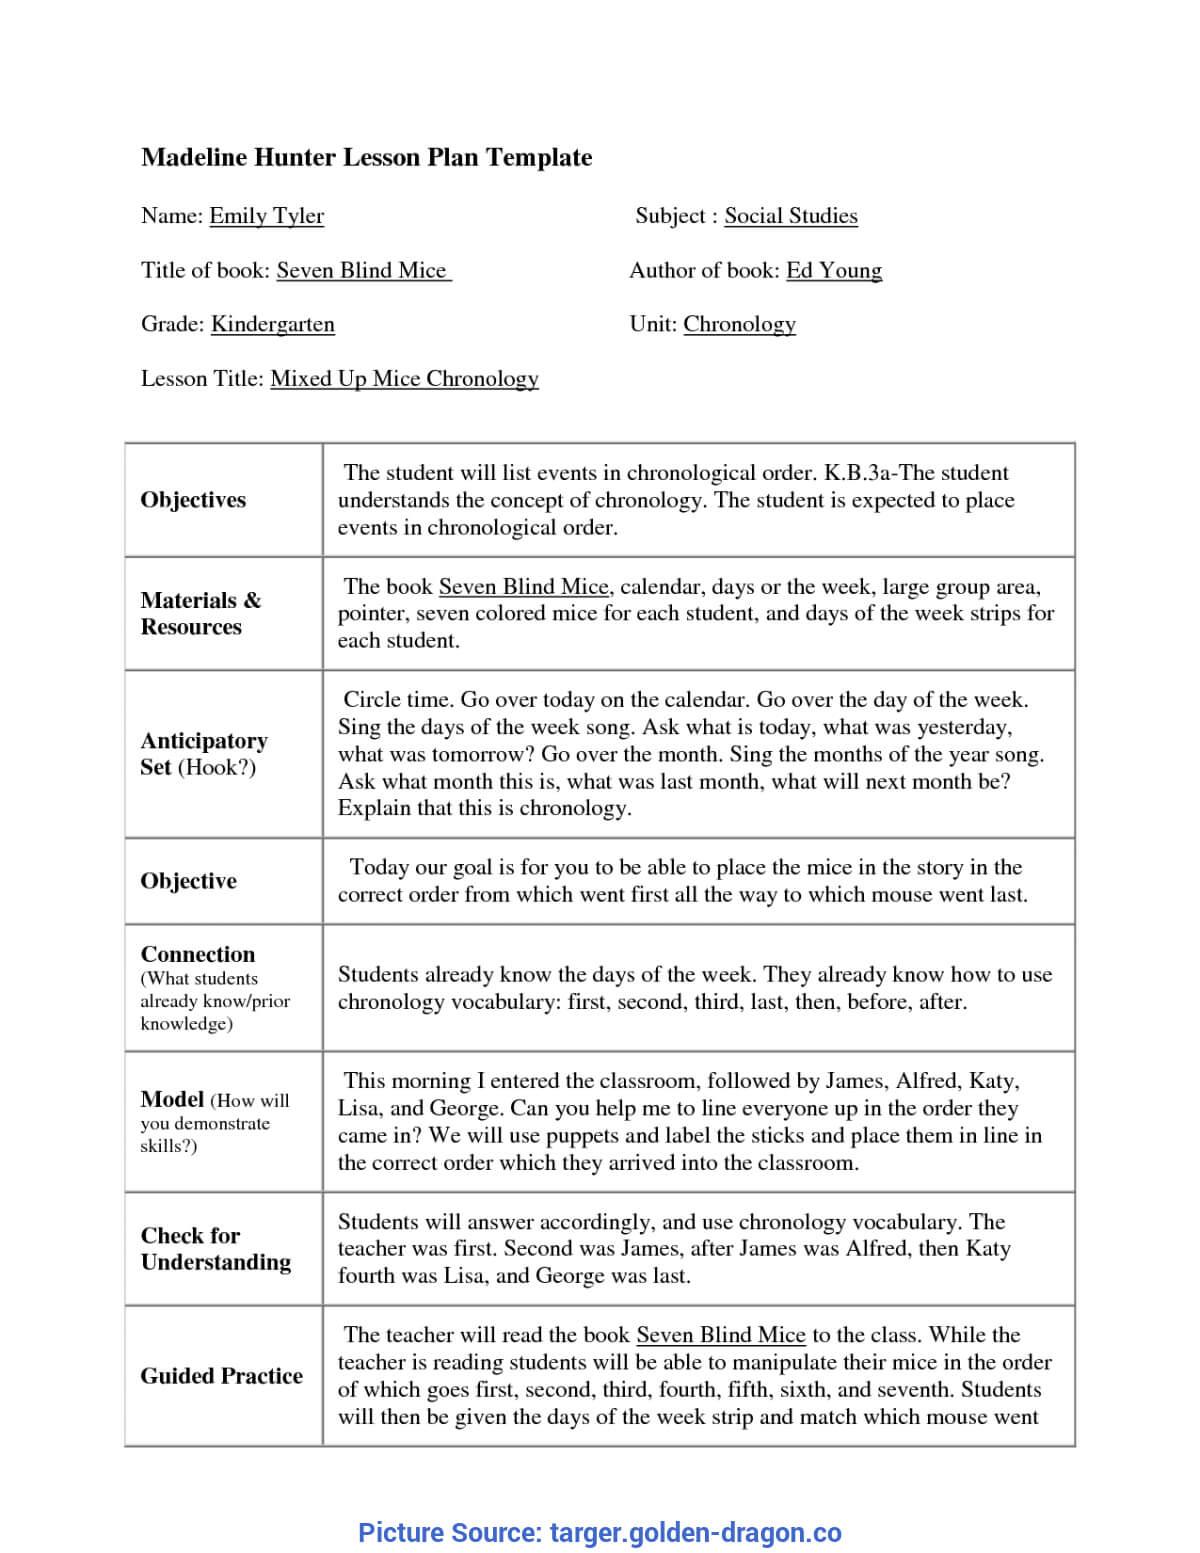 Top Madeline Hunter Lesson Plan Kindergarten Madeline Hunter For Madeline Hunter Lesson Plan Blank Template